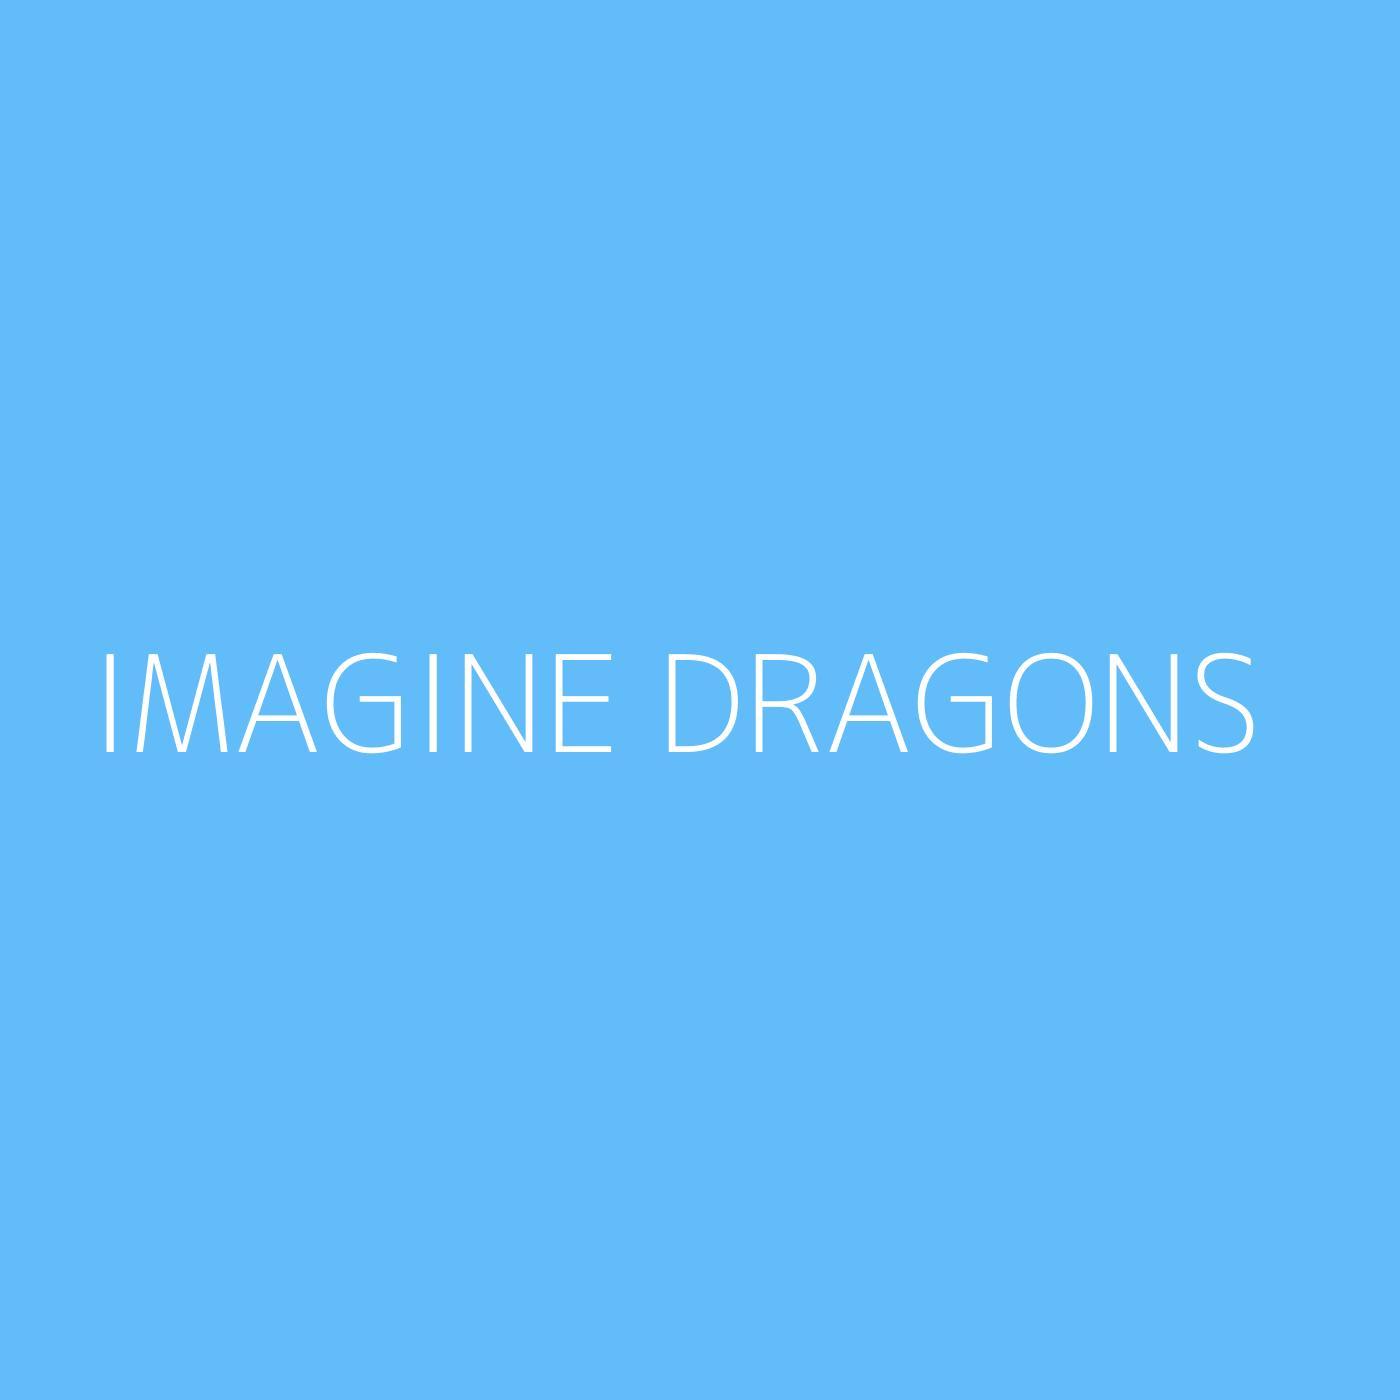 Imagine Dragons Playlist Artwork